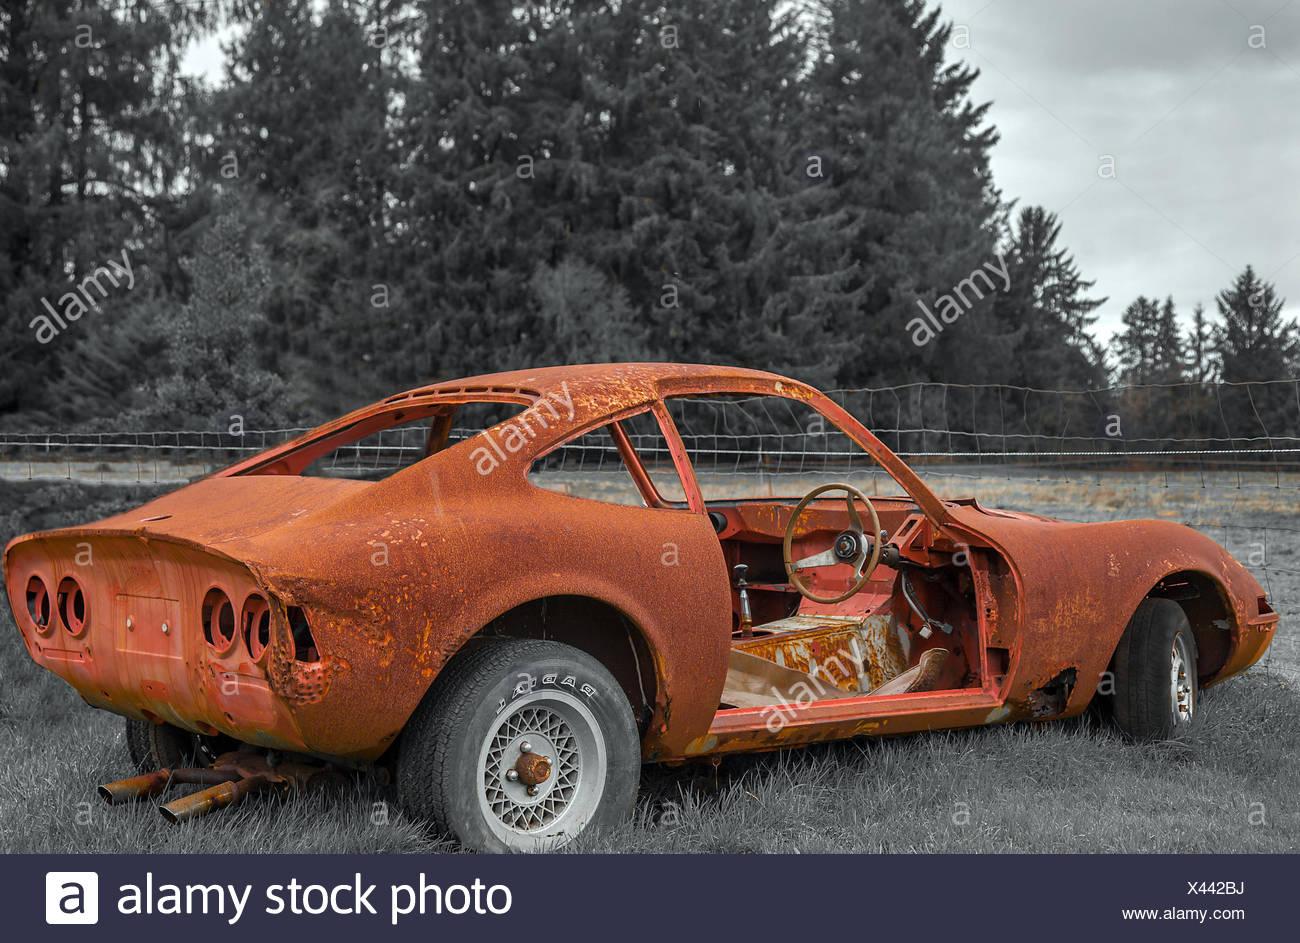 Vintage car in Oregon Stock Photo